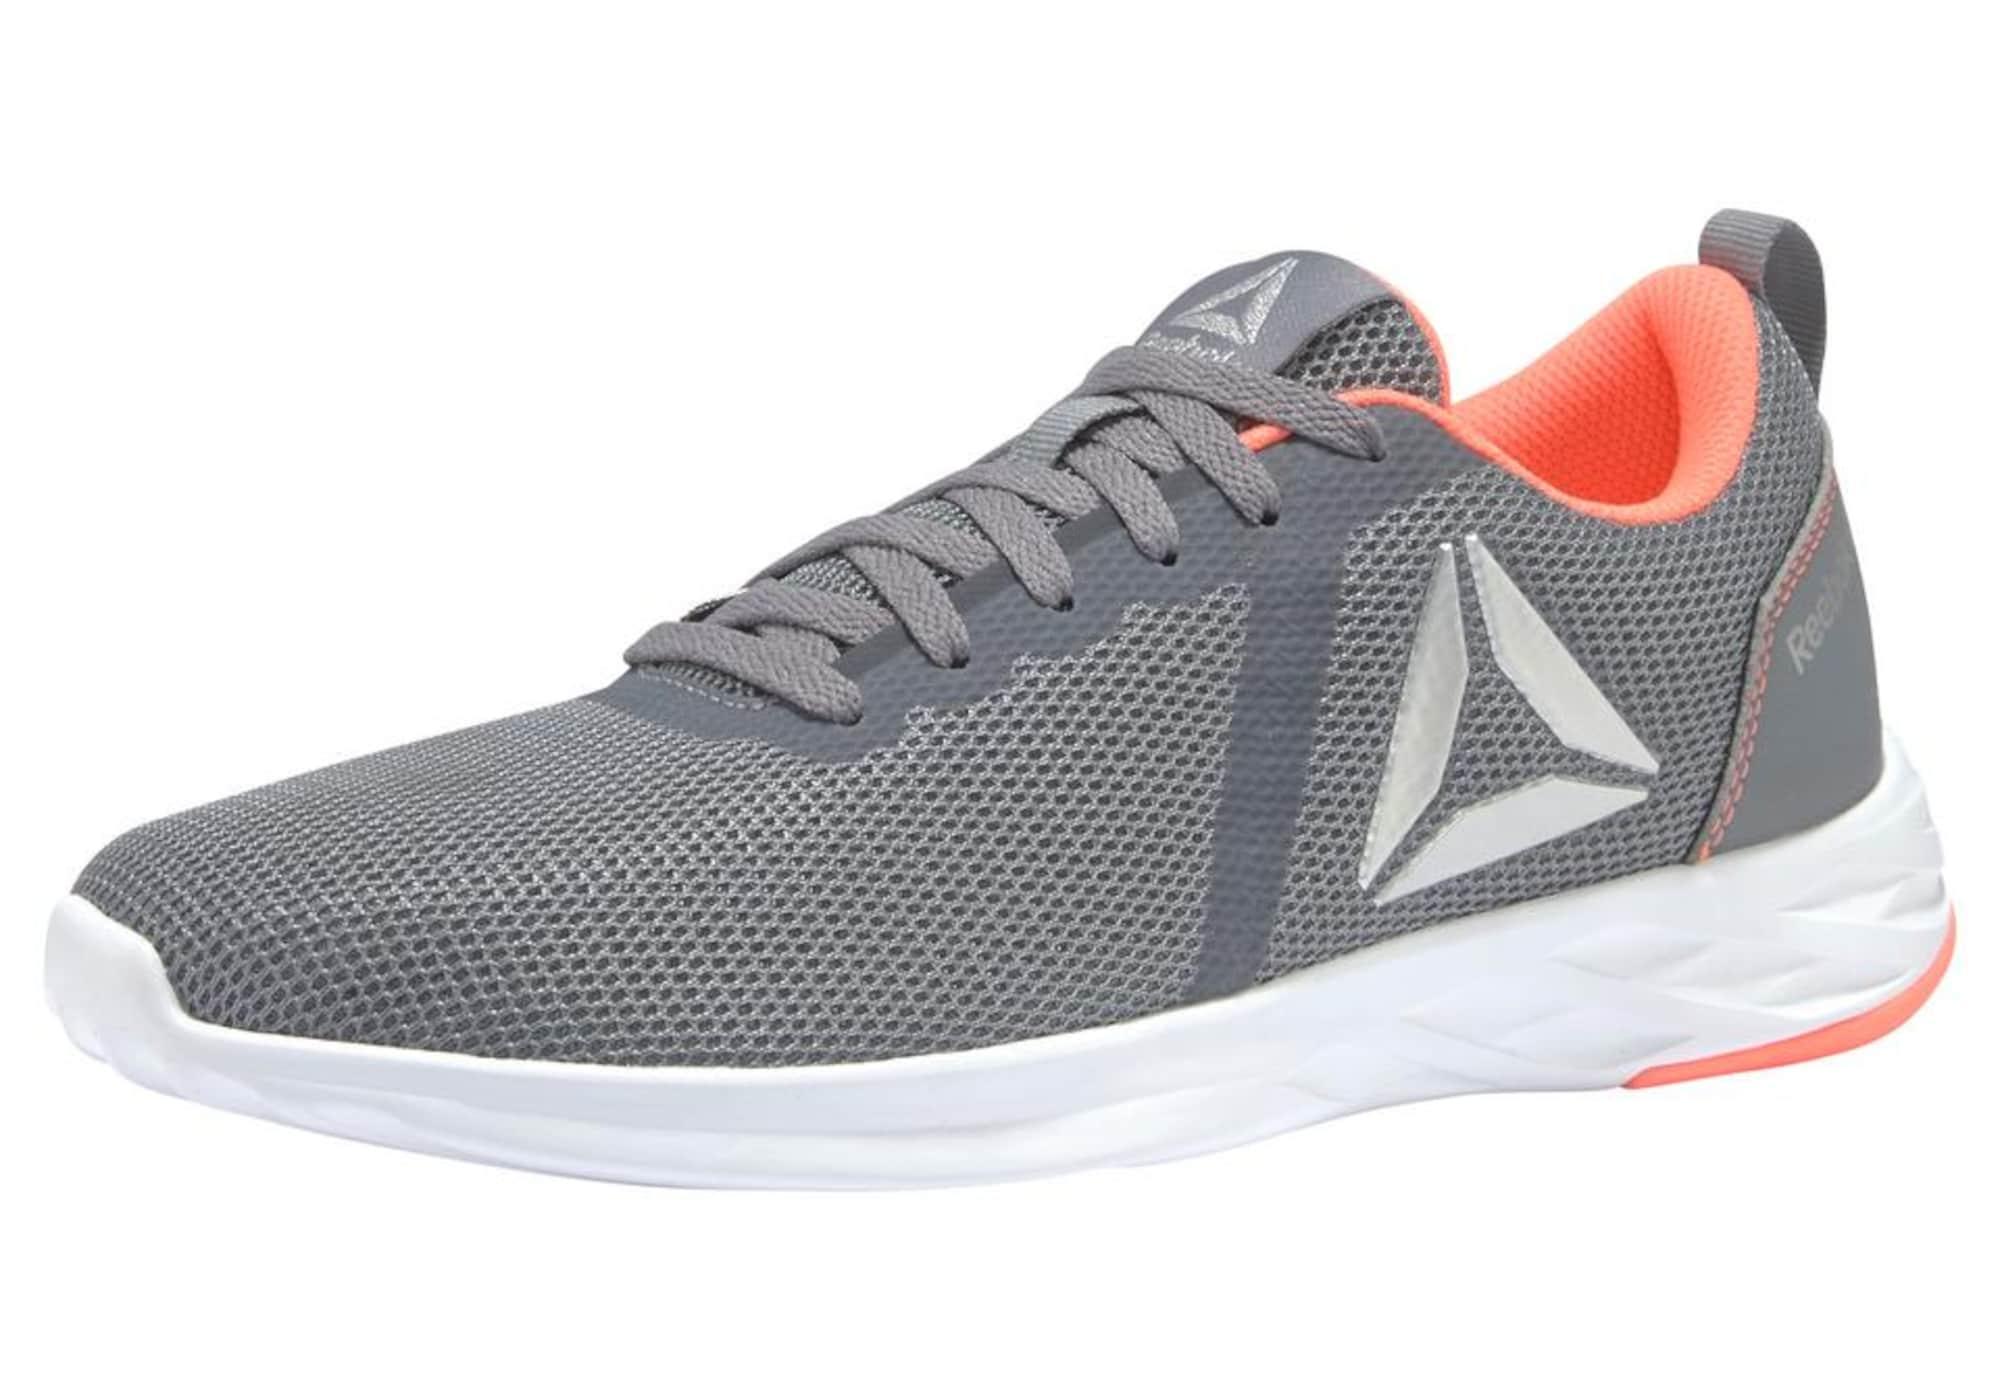 Laufschuh 'Astroride Essential' | Schuhe > Sportschuhe > Laufschuhe | Silbergrau | Reebok